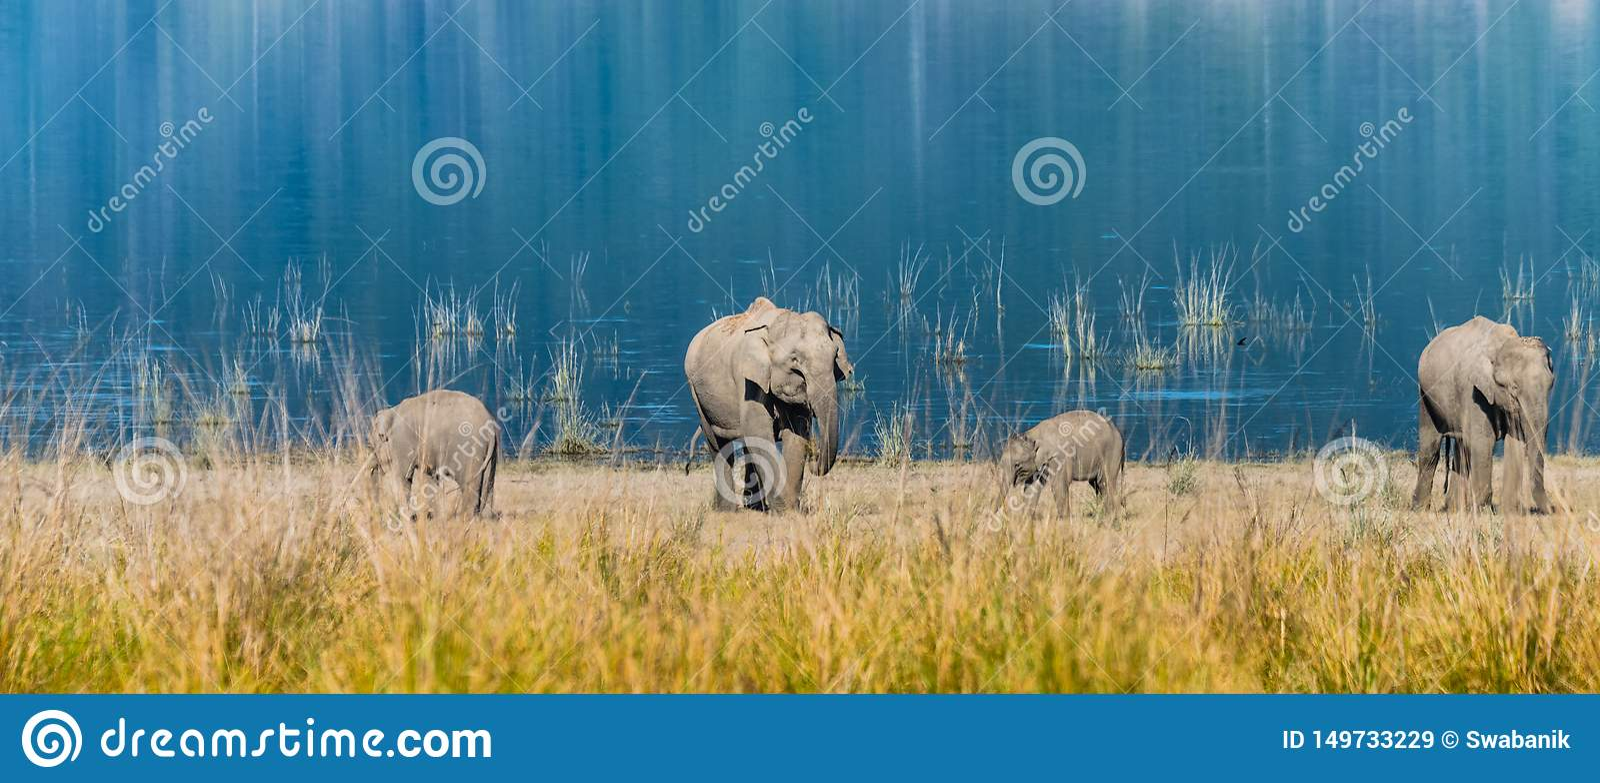 Elephant family at Grassland of Jim Corbett